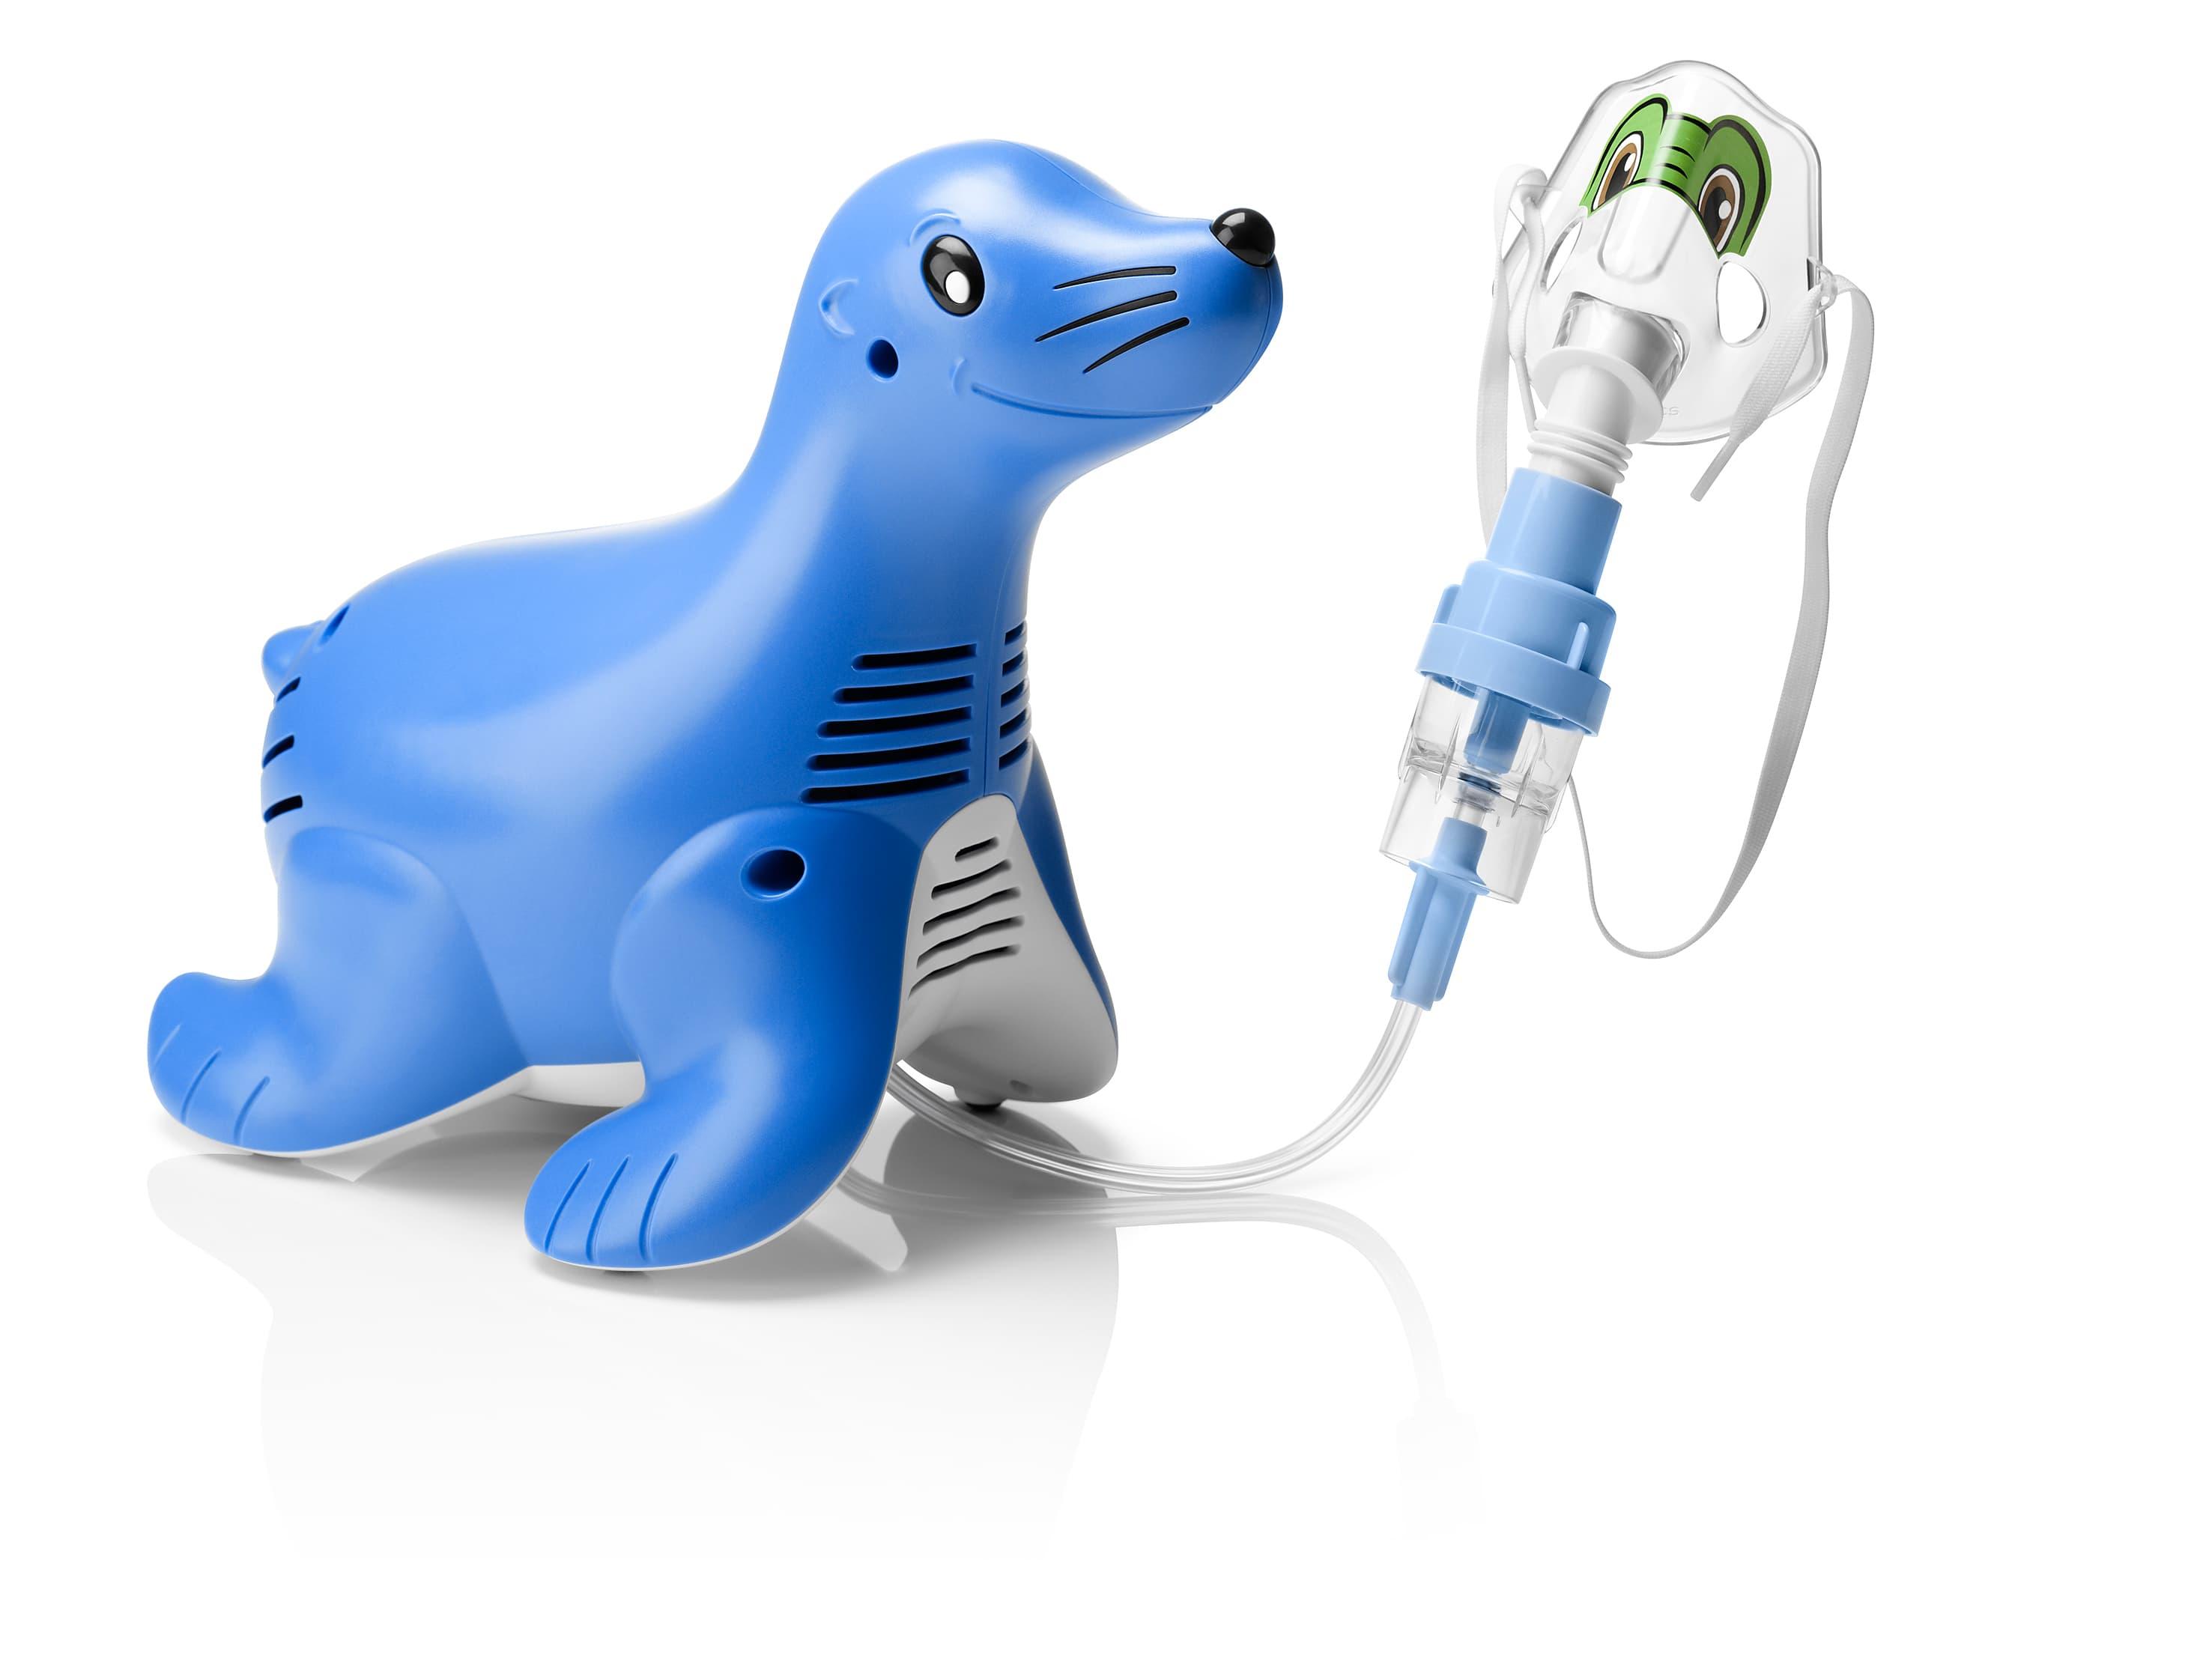 Philips Respironics InnoSpire the Seal